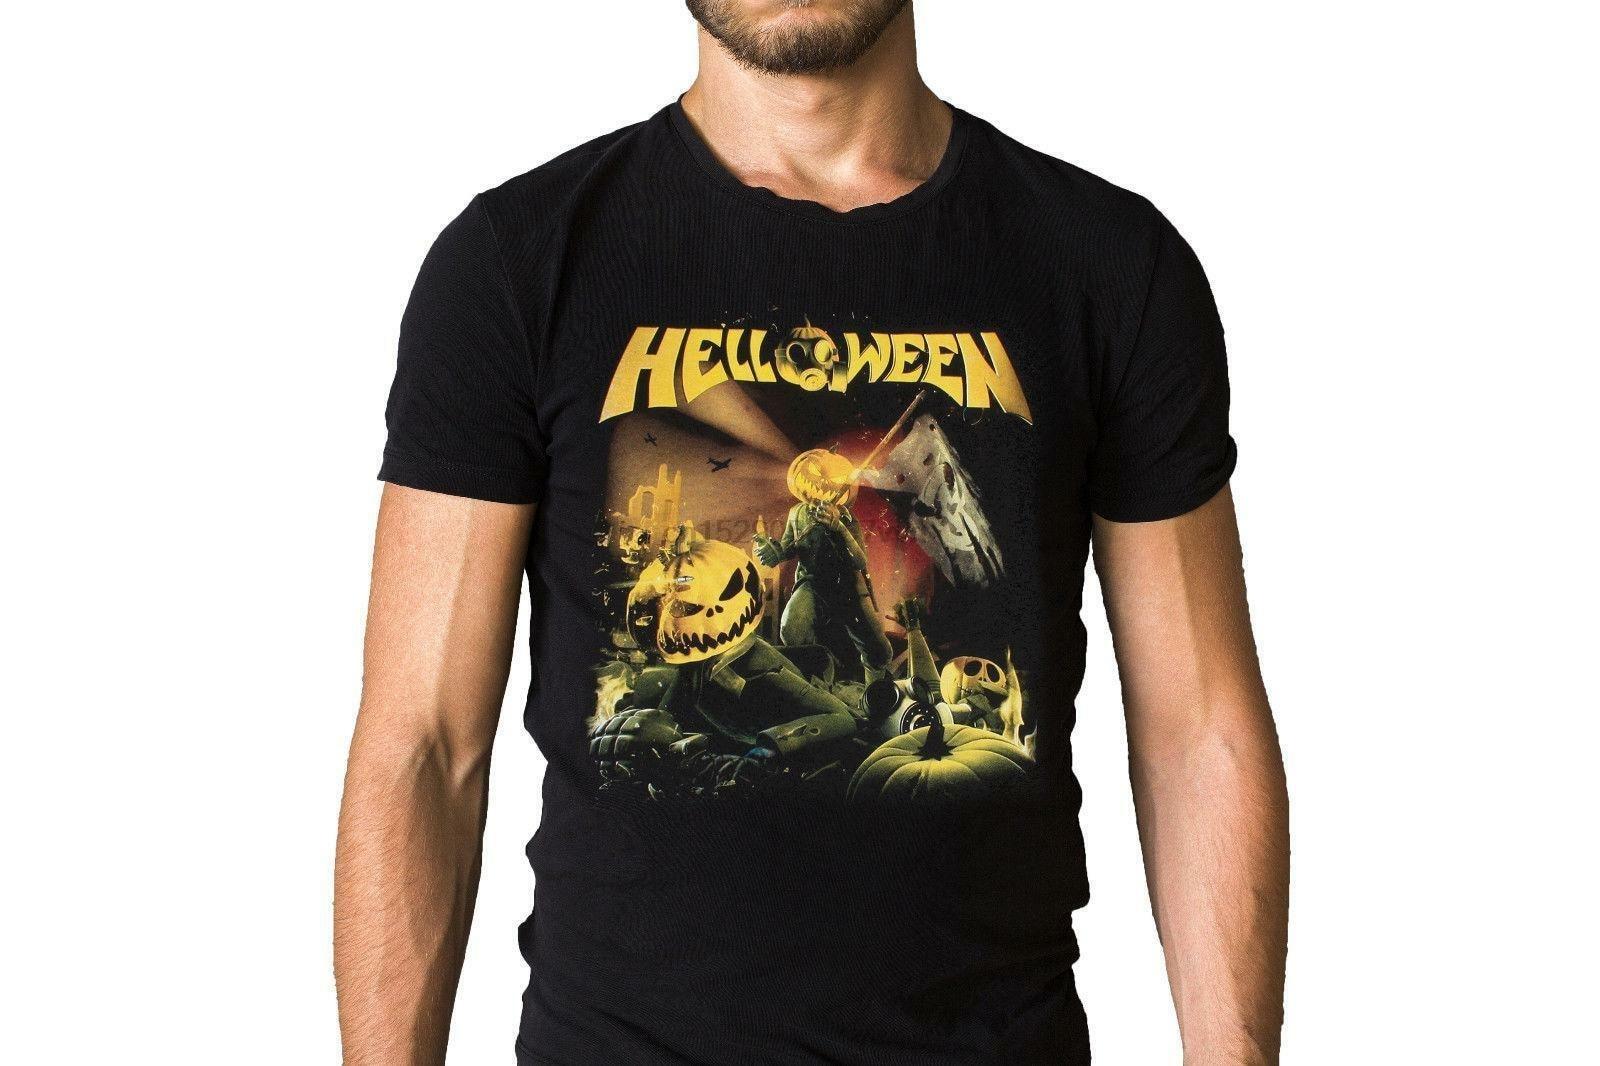 Helloween camiseta reta para fora tamanho xl mercadoria oficial